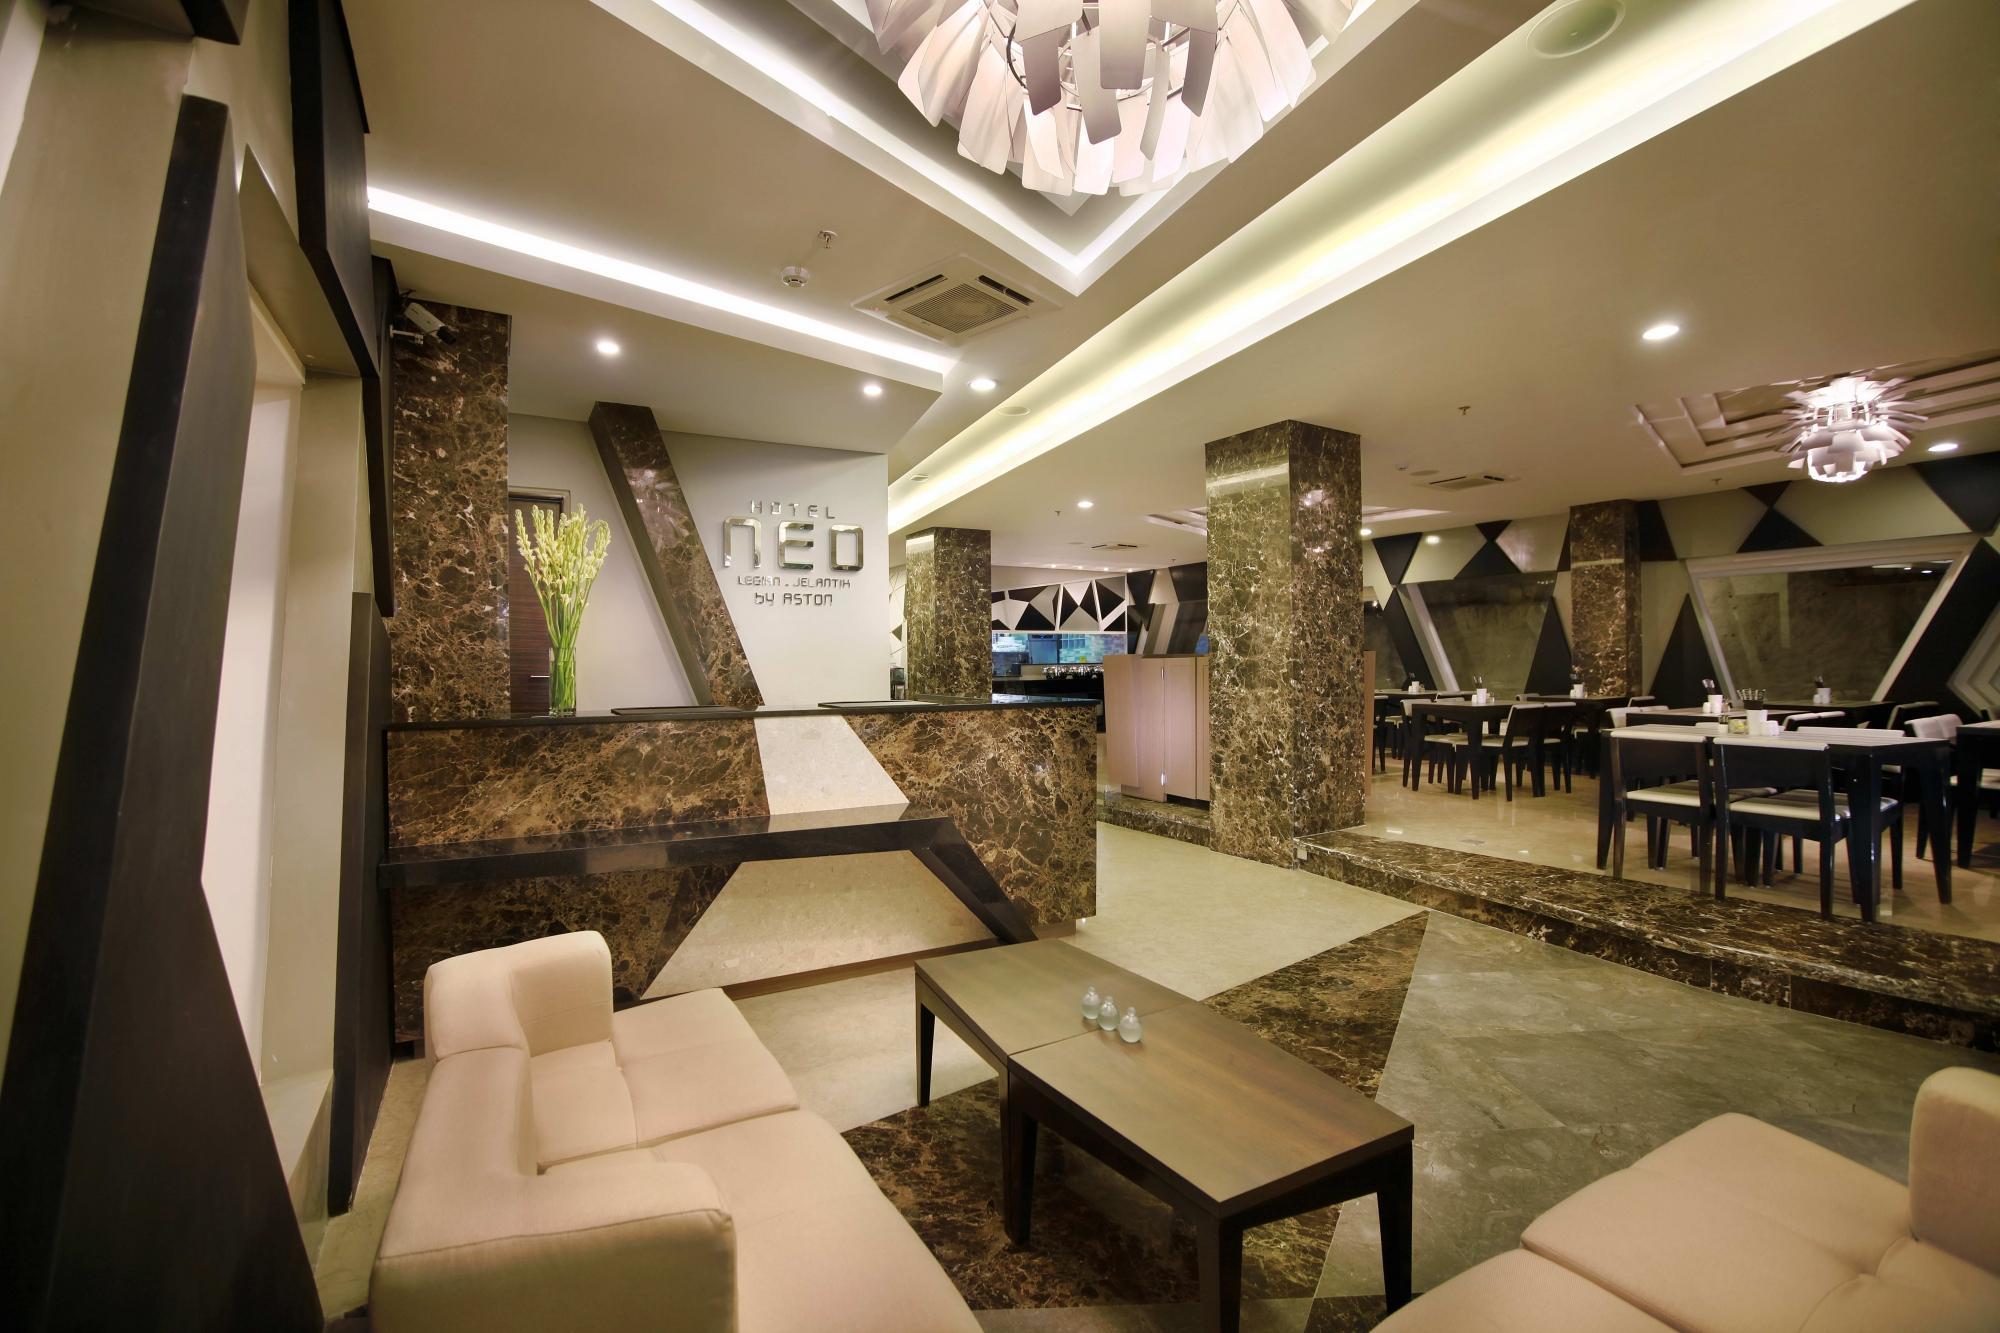 Hotel Neo Kuta Jelantik